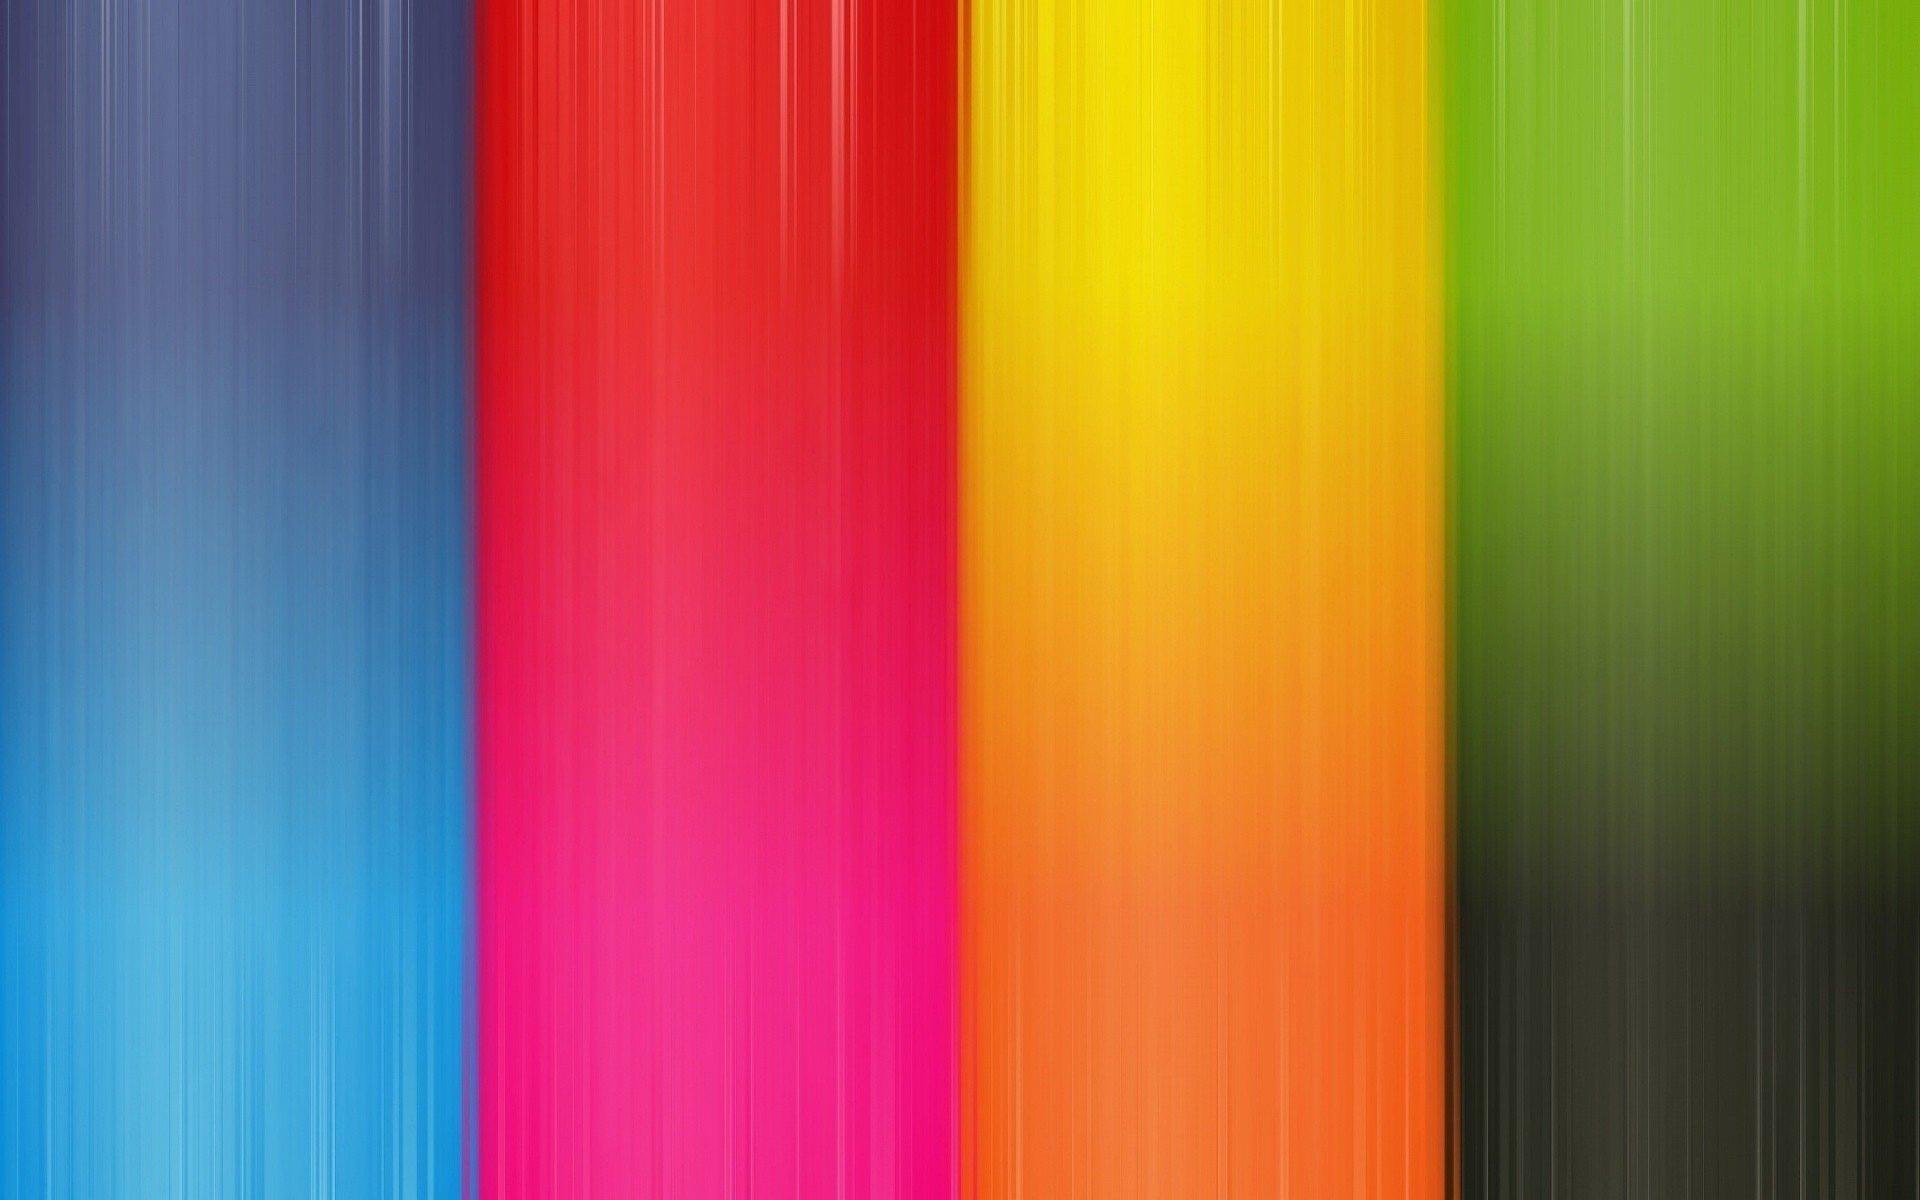 wallpaper.wiki-Textures-rainbows-stripes-patterns-wallpaper-pink-